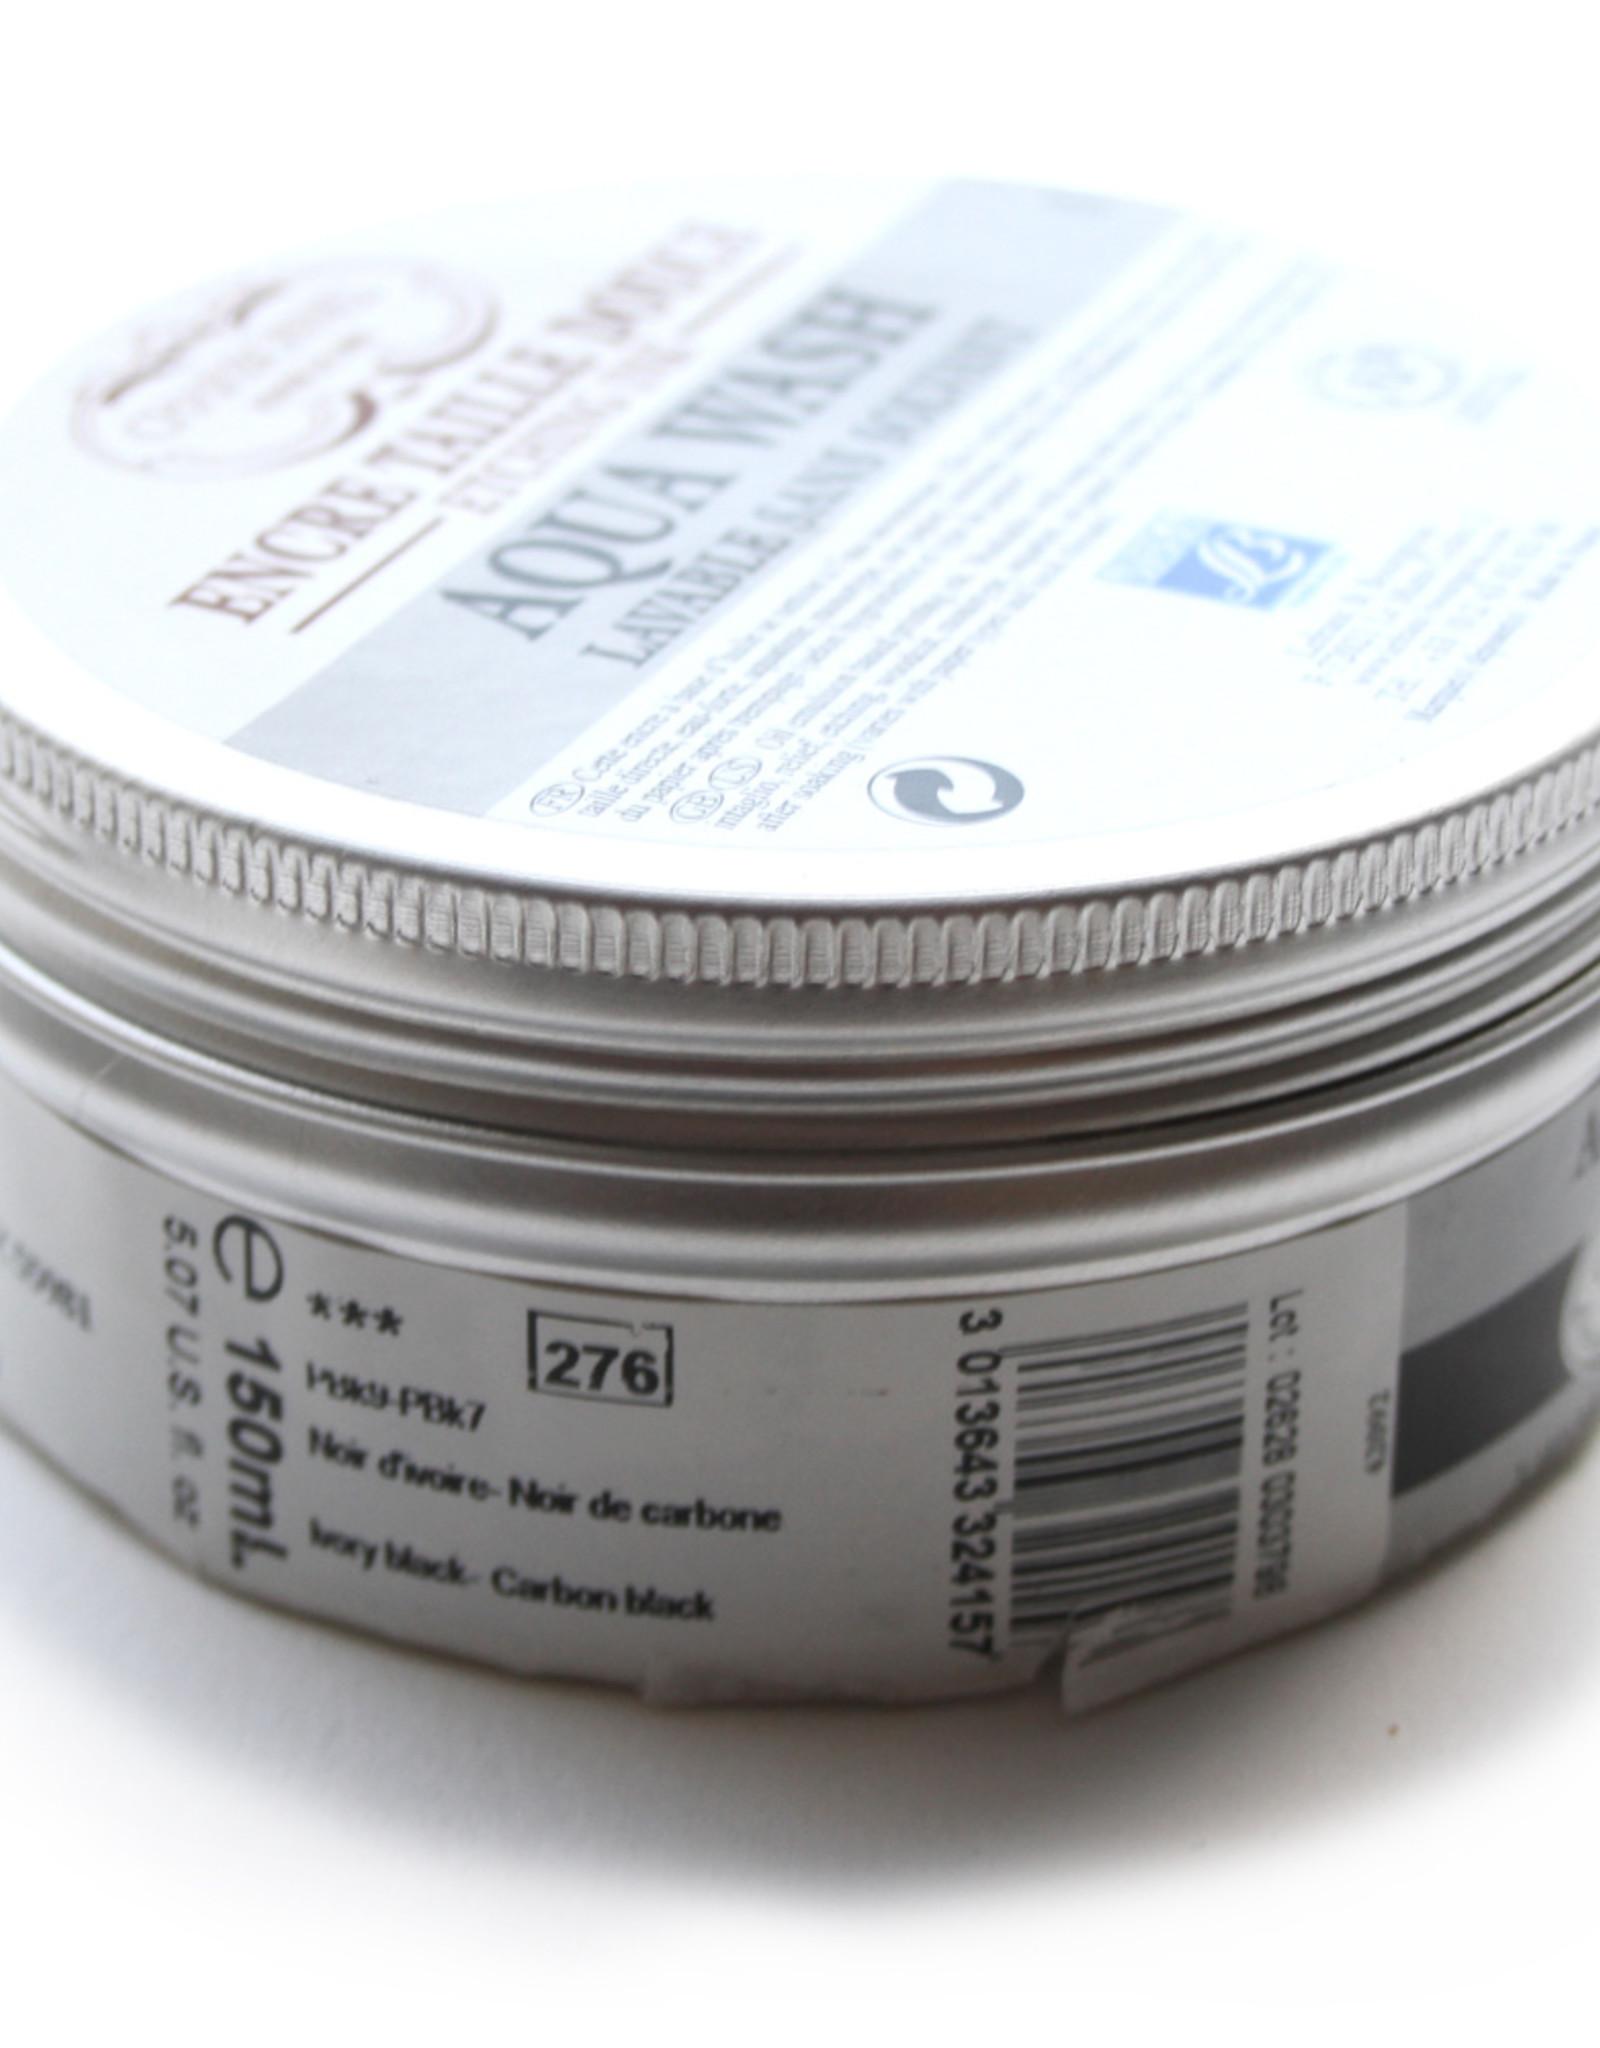 L&B Charbonnel Etsinkt Aqua Wash 150ml Zwart Koolstof / Carbon Black Serie 1 no 291